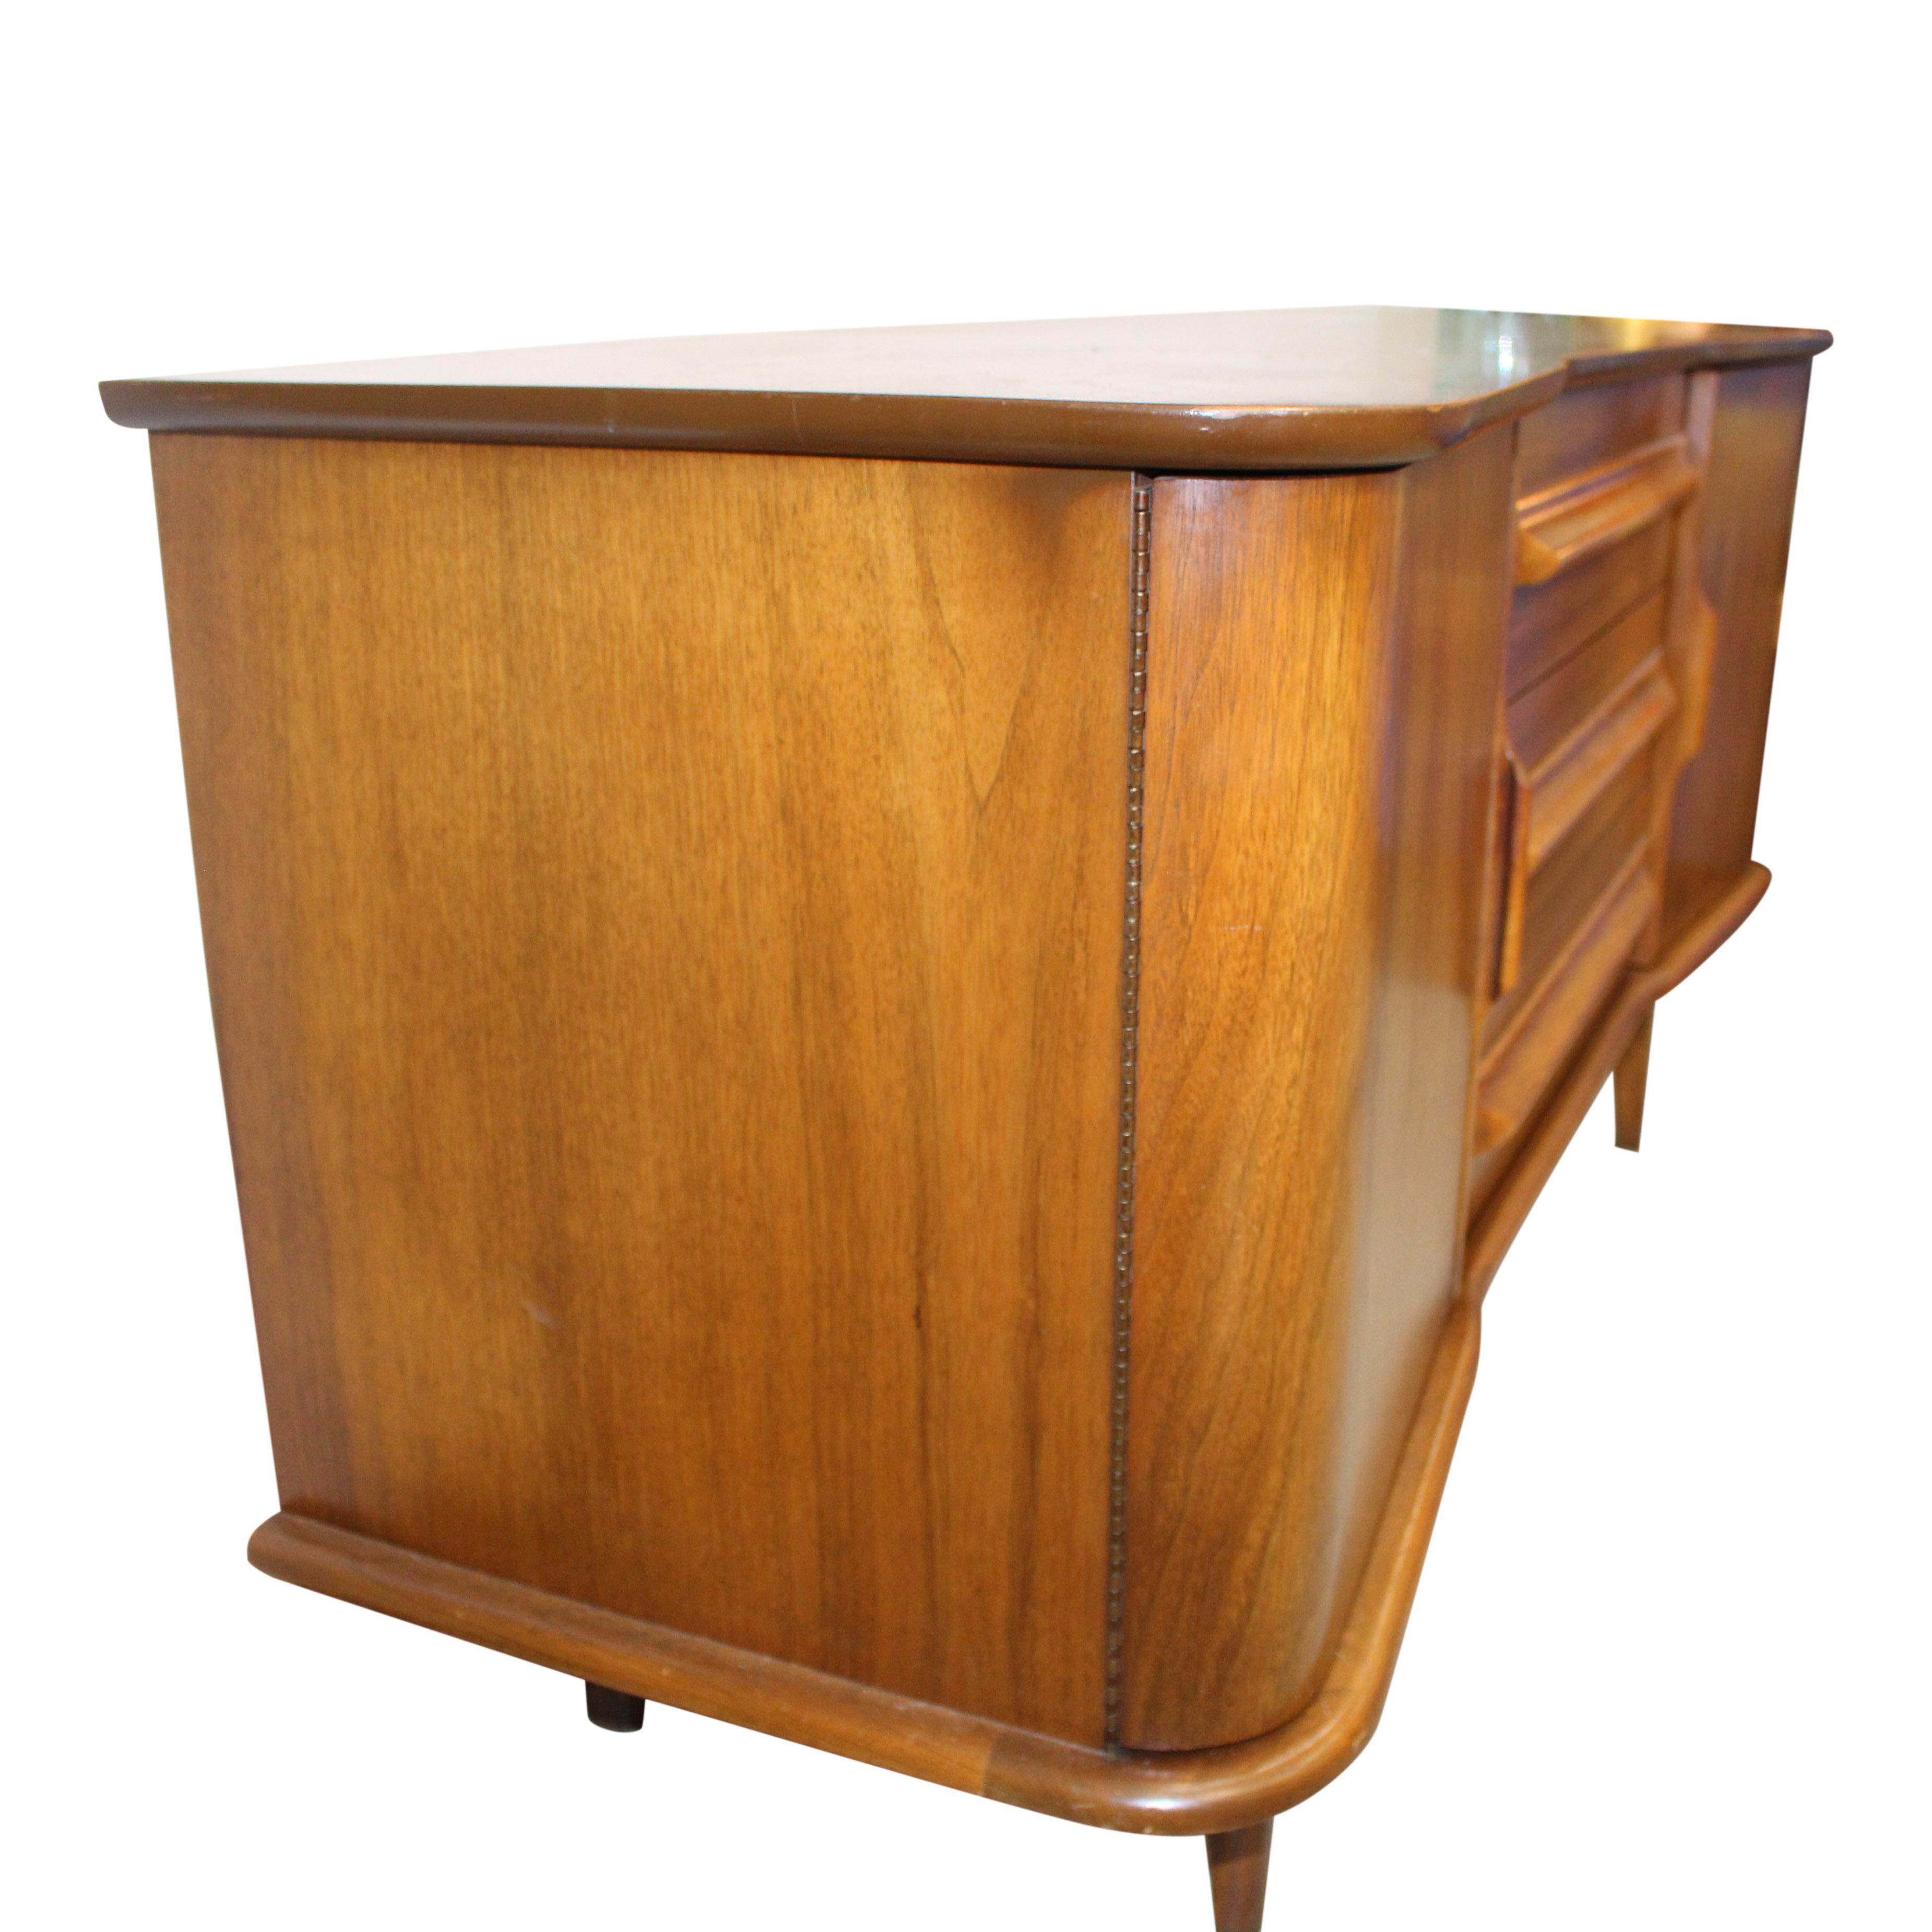 United Furniture Corporation MidCentury Ash Mahogany Credenza